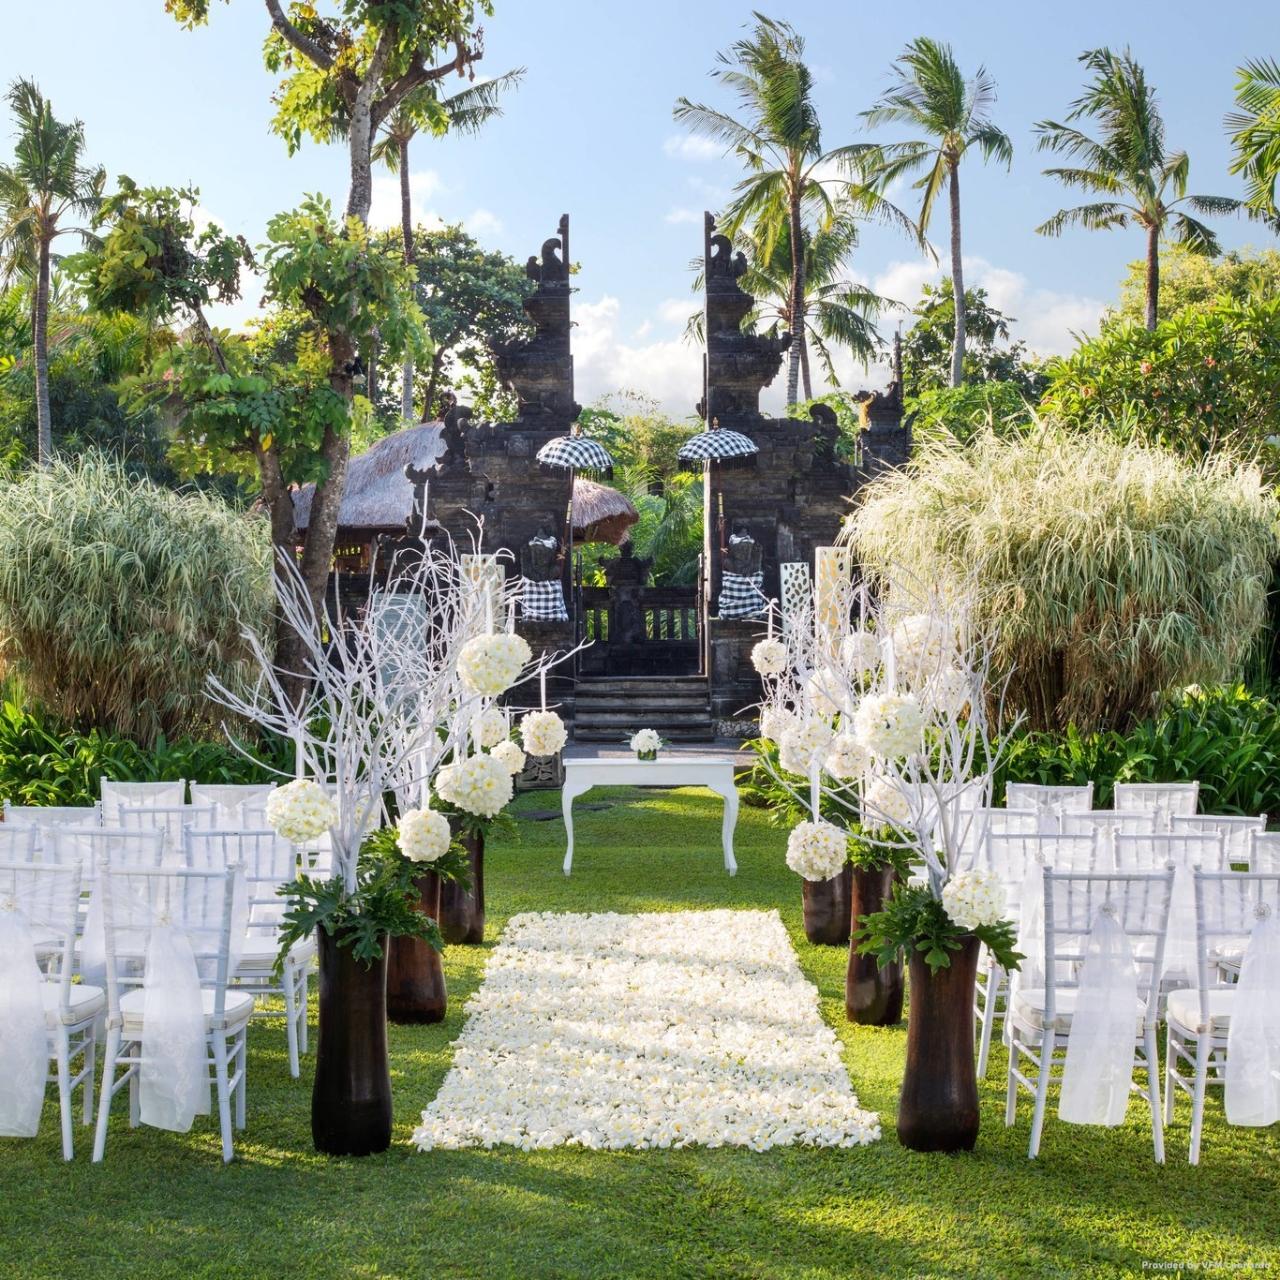 Hotel The Laguna A Luxury Collection Resort Spa Nusa Dua Bali 5 Hrs Star Hotel In Nusa Dua Bali